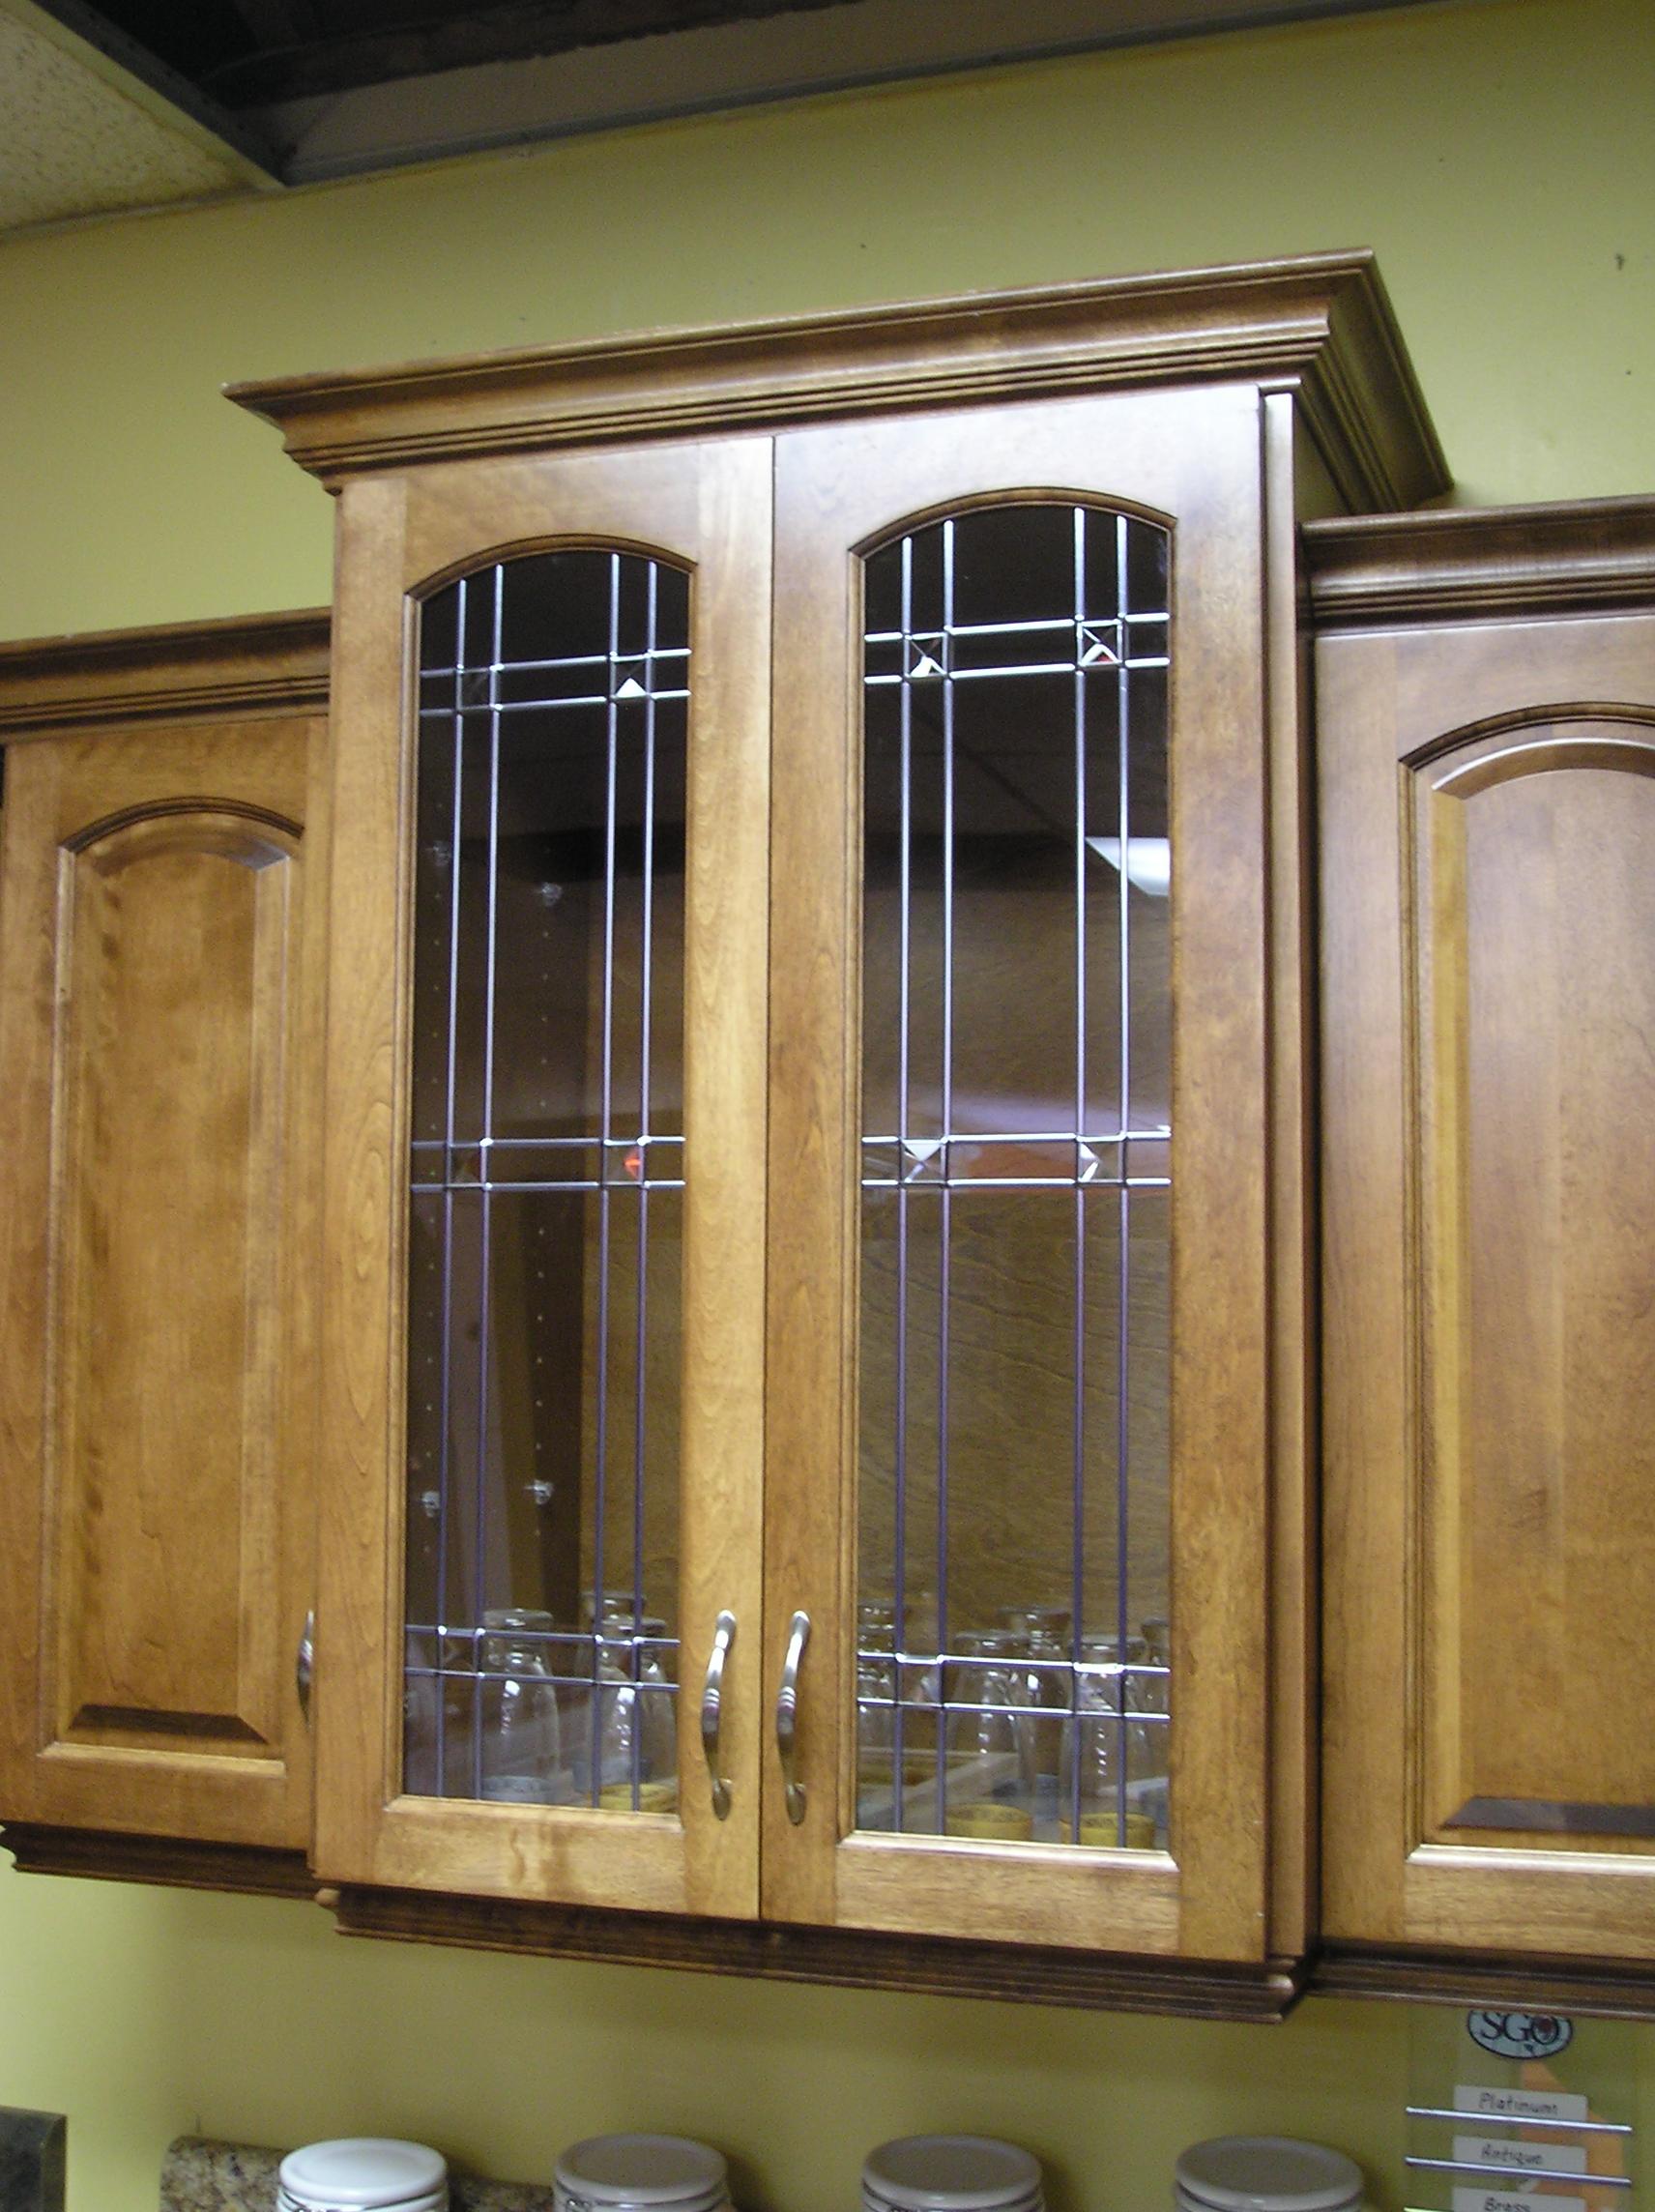 cabinets (5).jpg